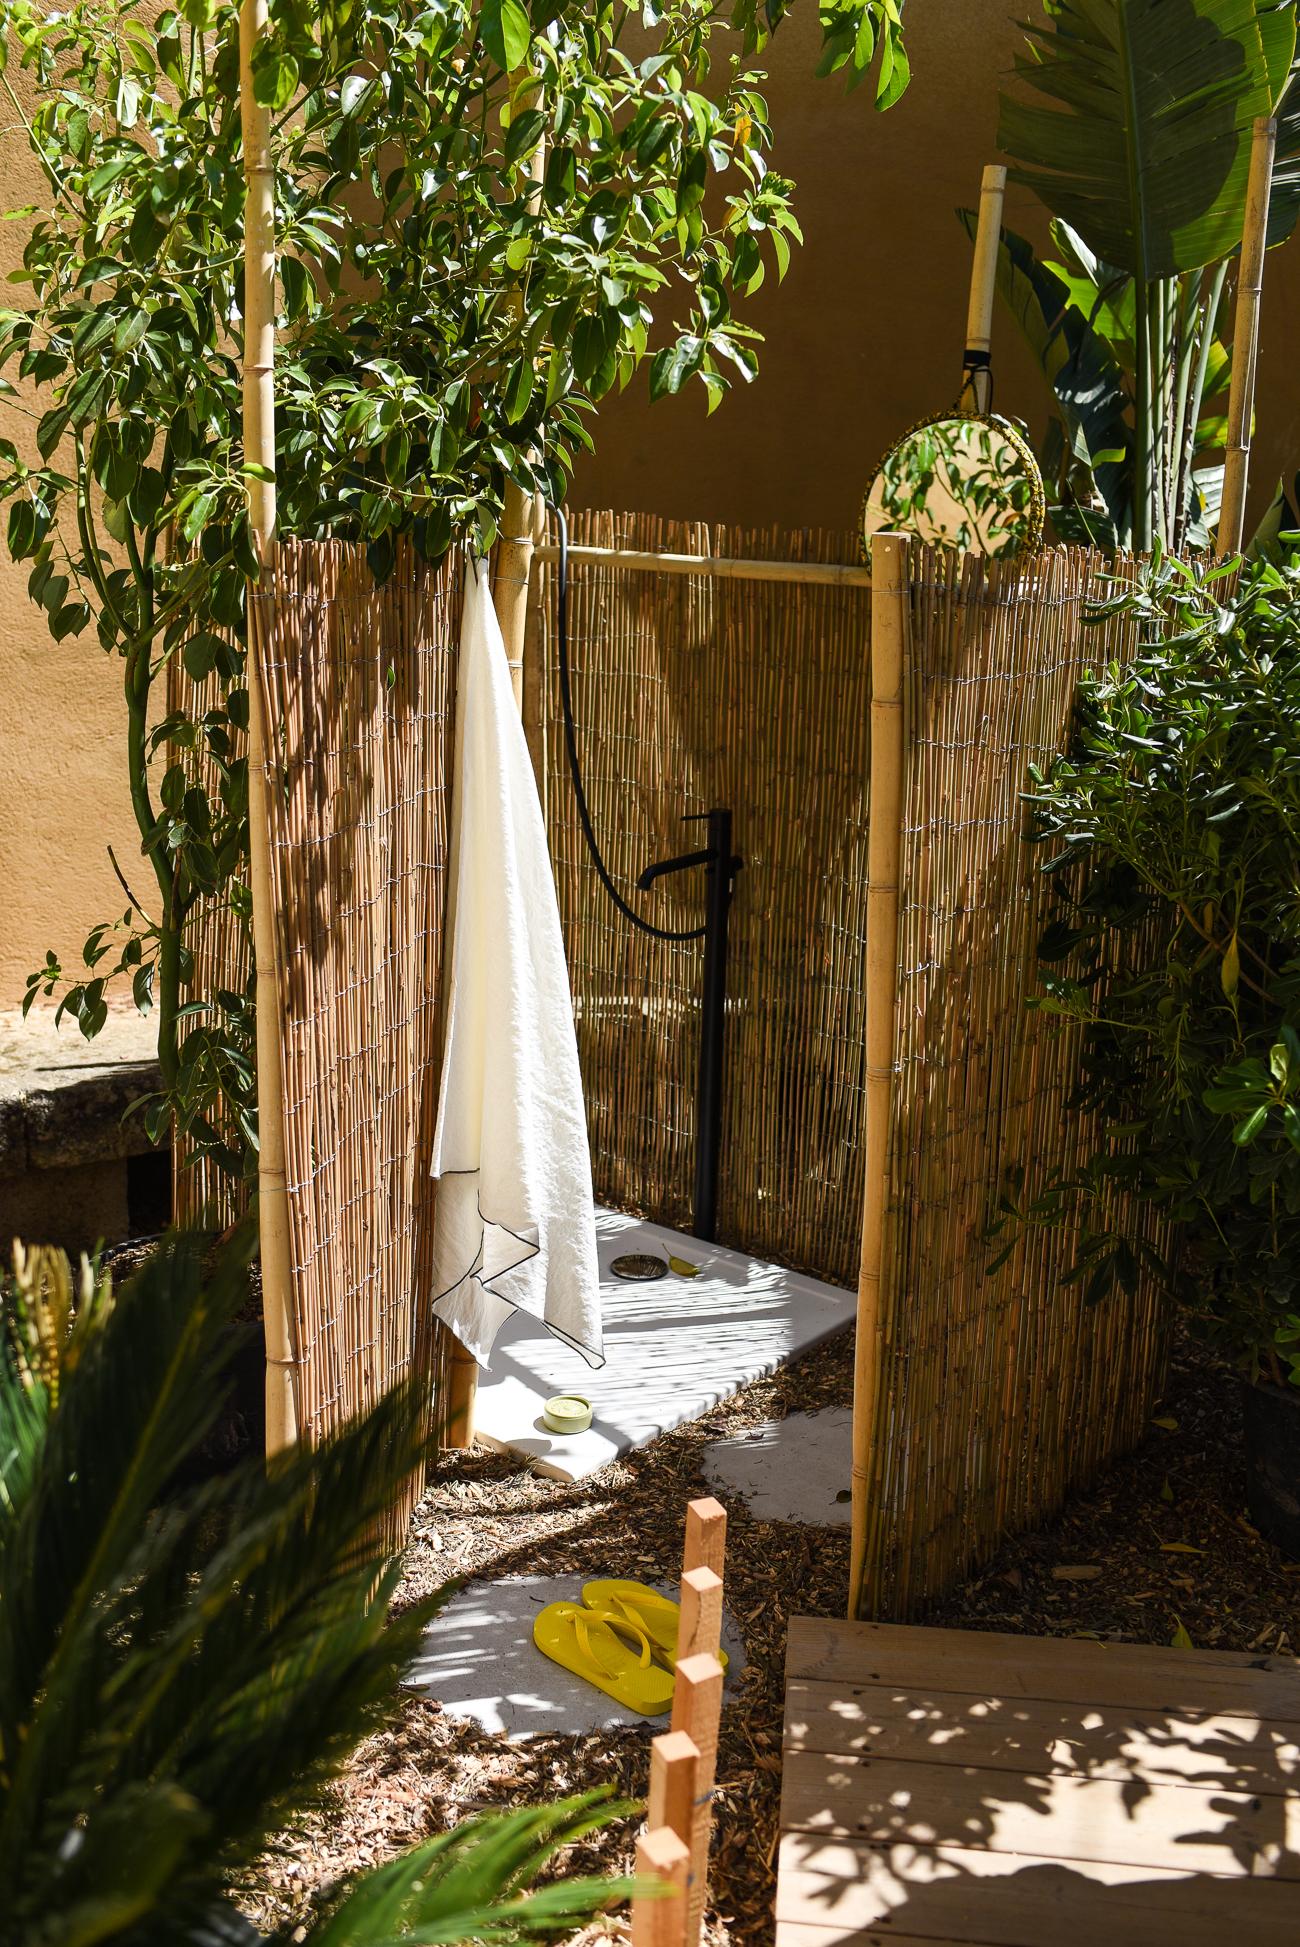 le-studio-twinky-photographe-salon-vivre-cote-sud-2019-aix-en-provence-37.jpg